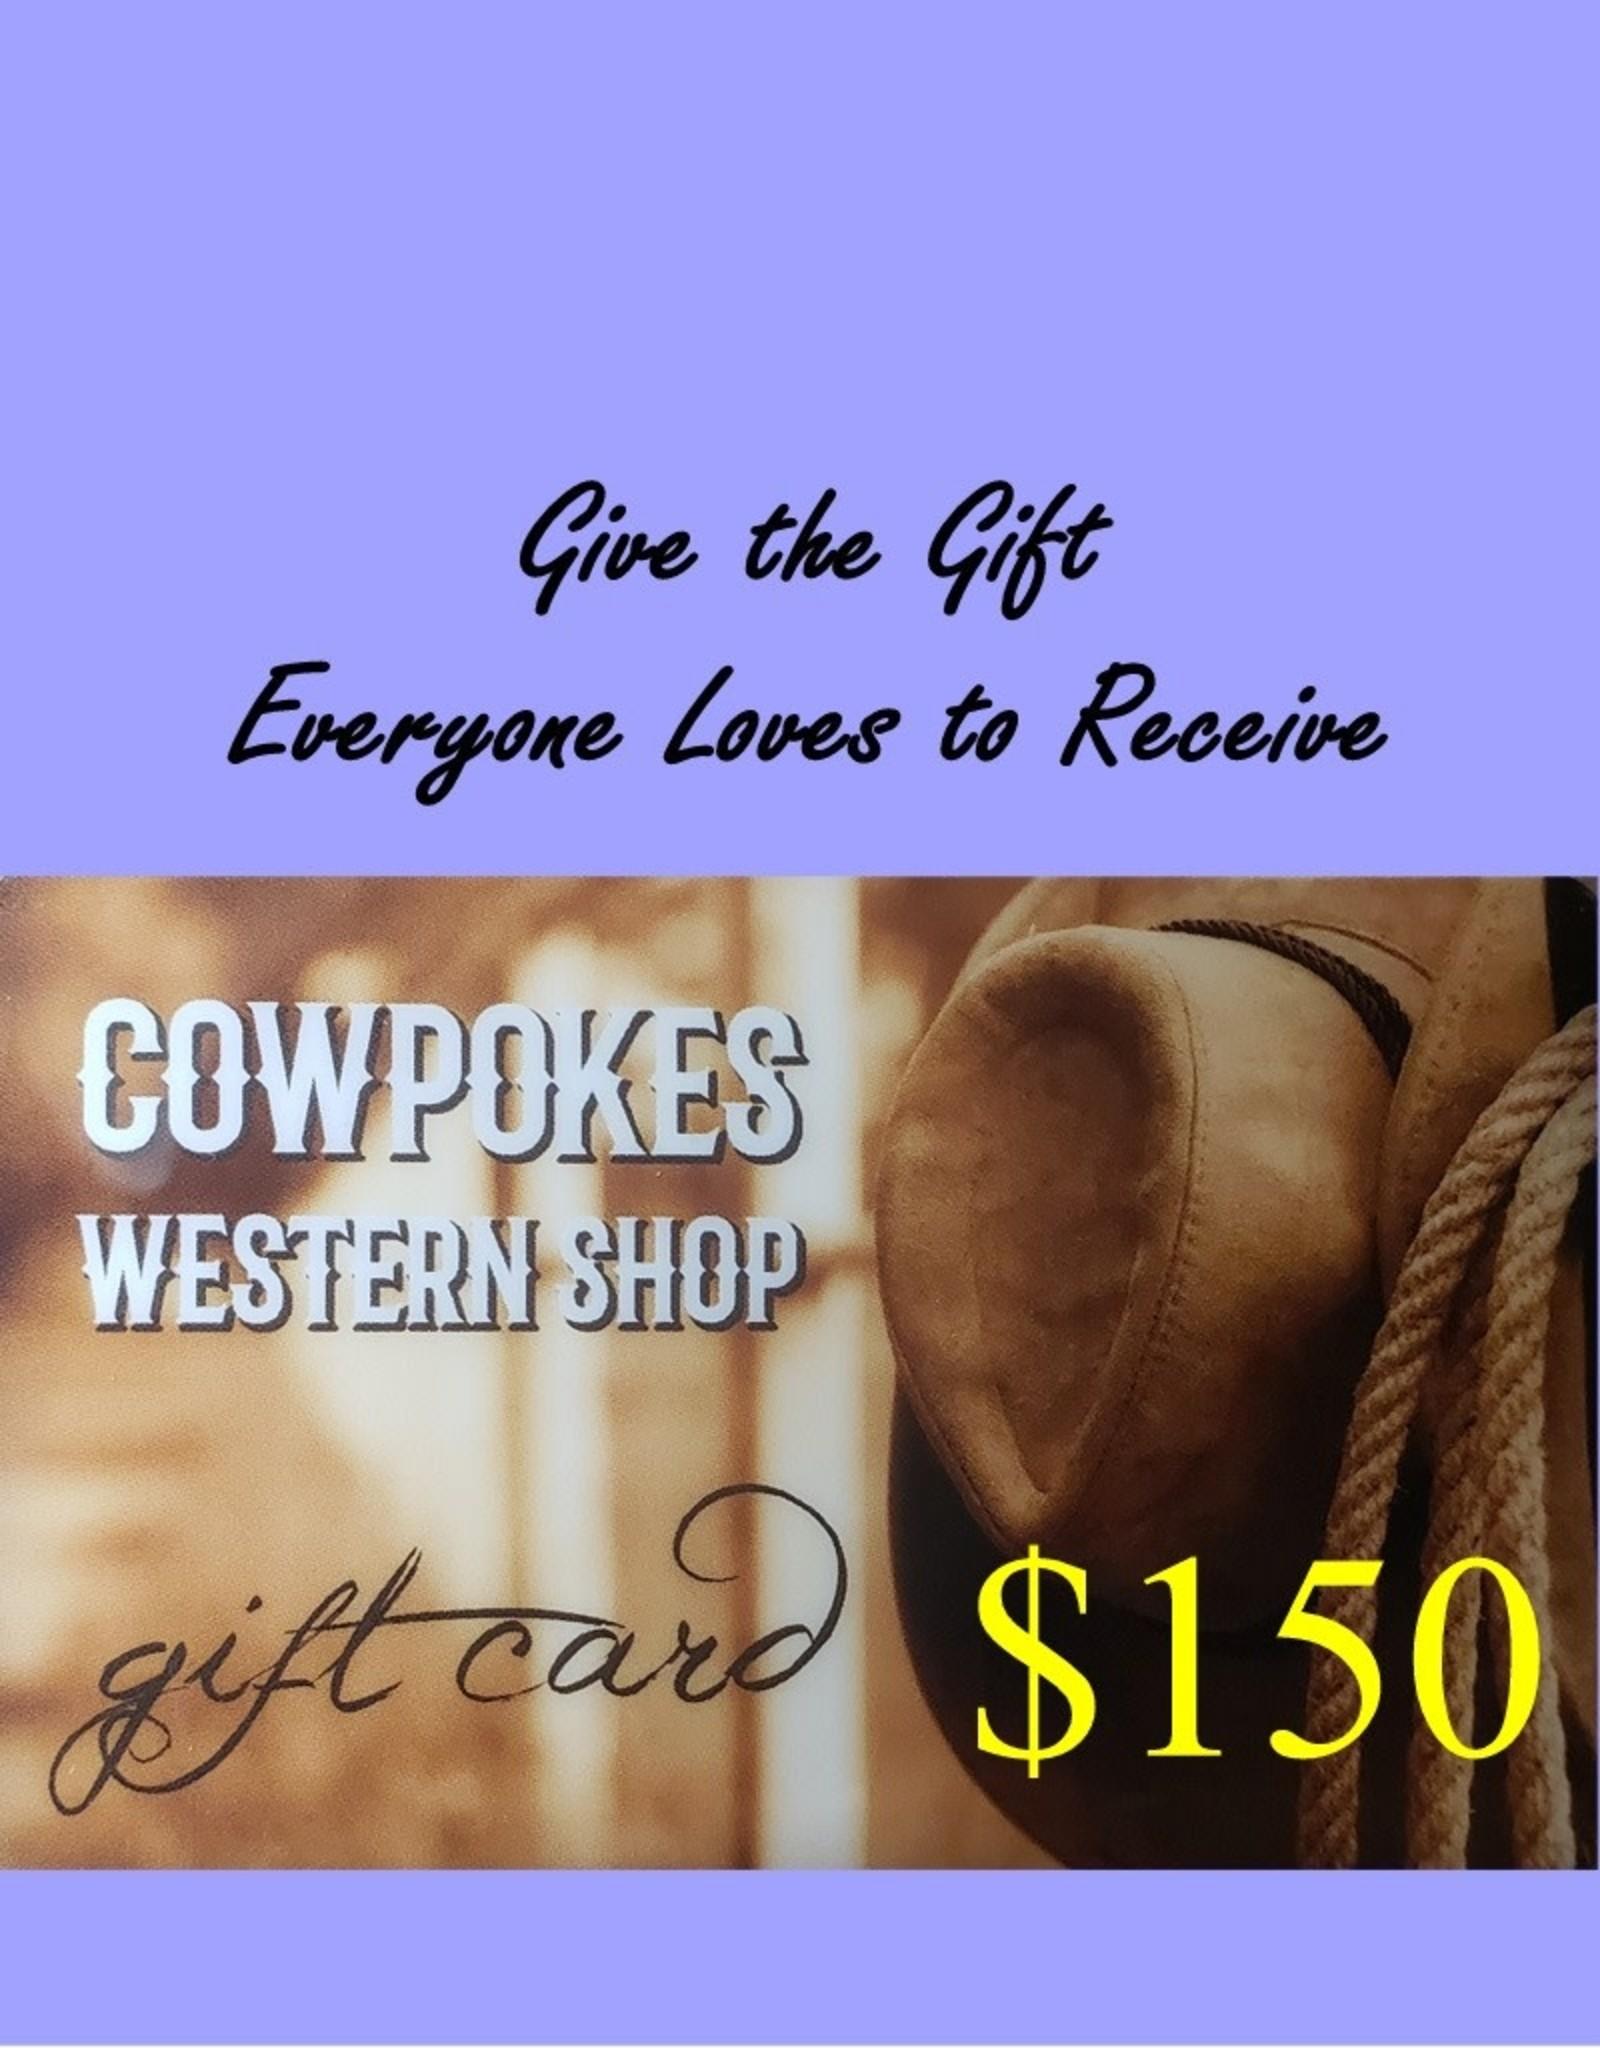 Cowpokes Western Shop Gift Card $150